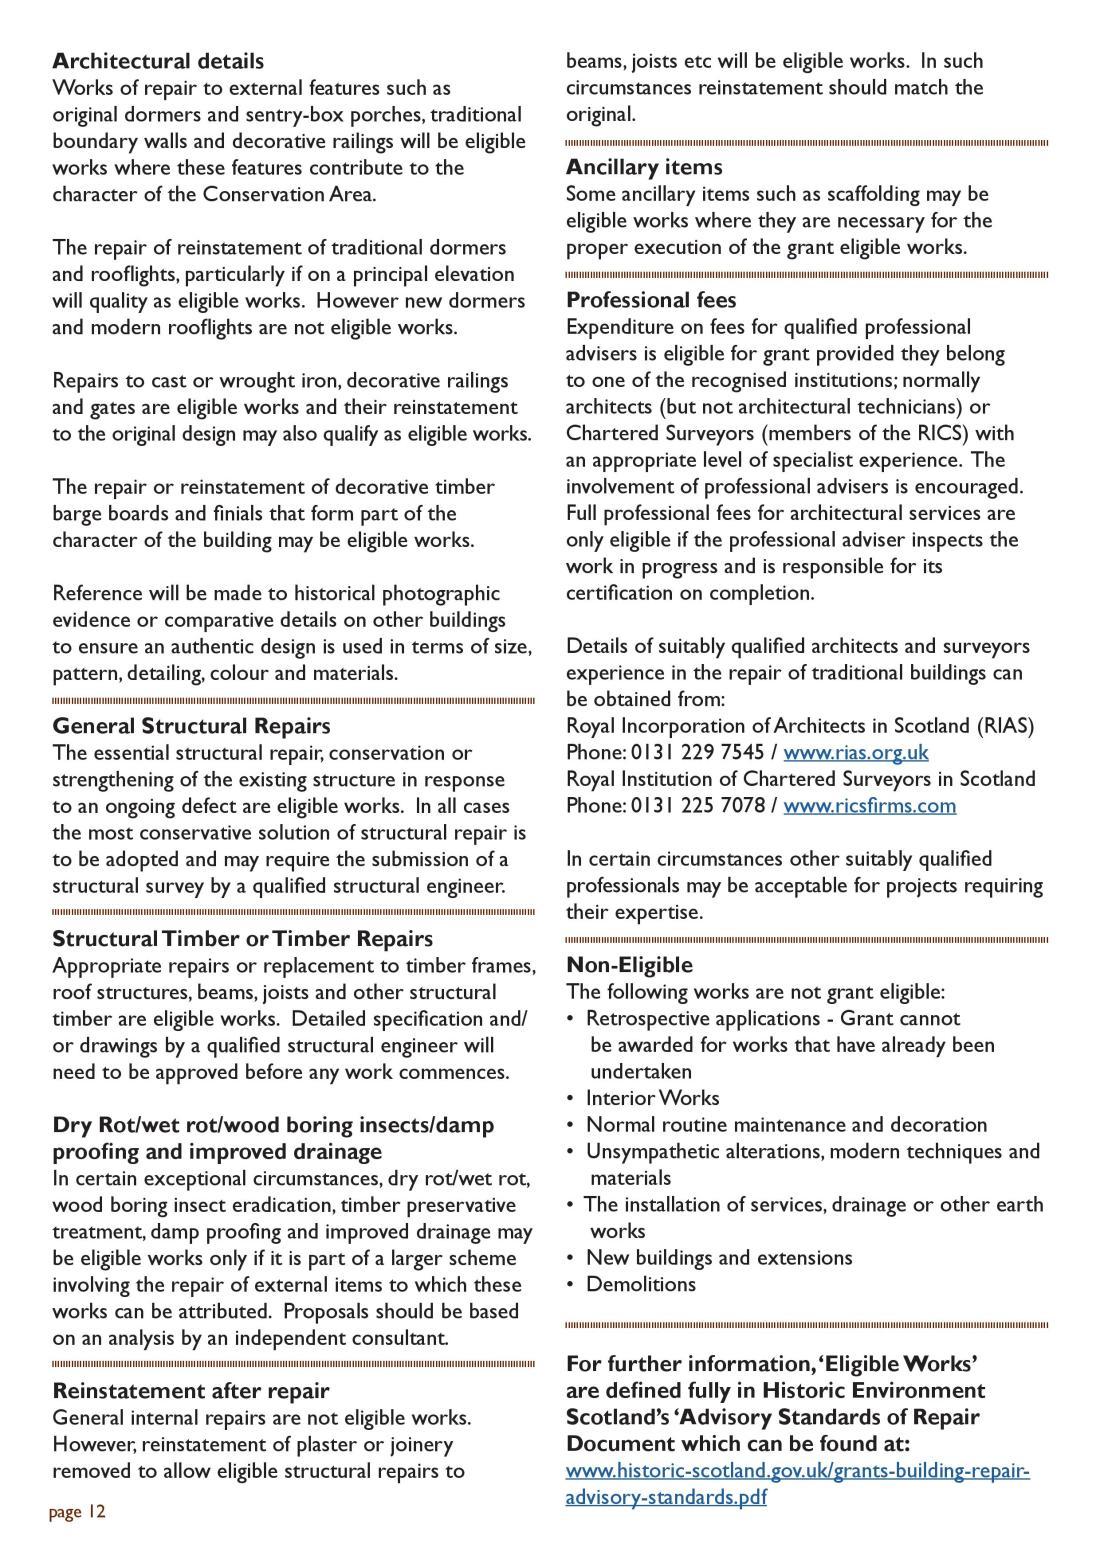 SCARS leaflet PDF SH-page-014